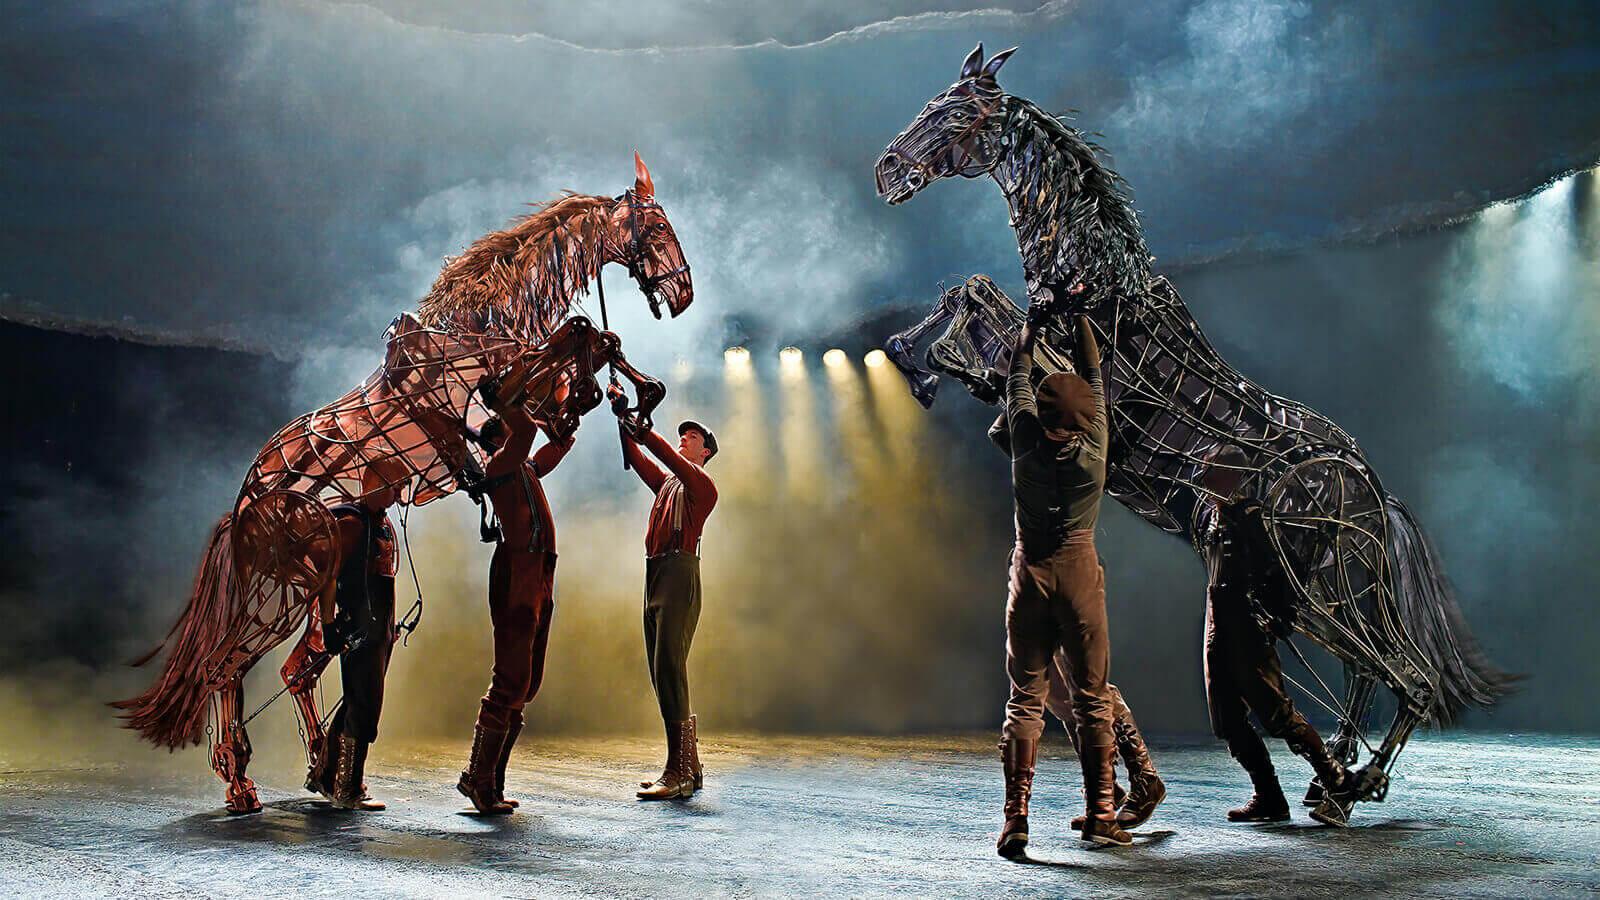 War Horse UK Tour - Production Photo